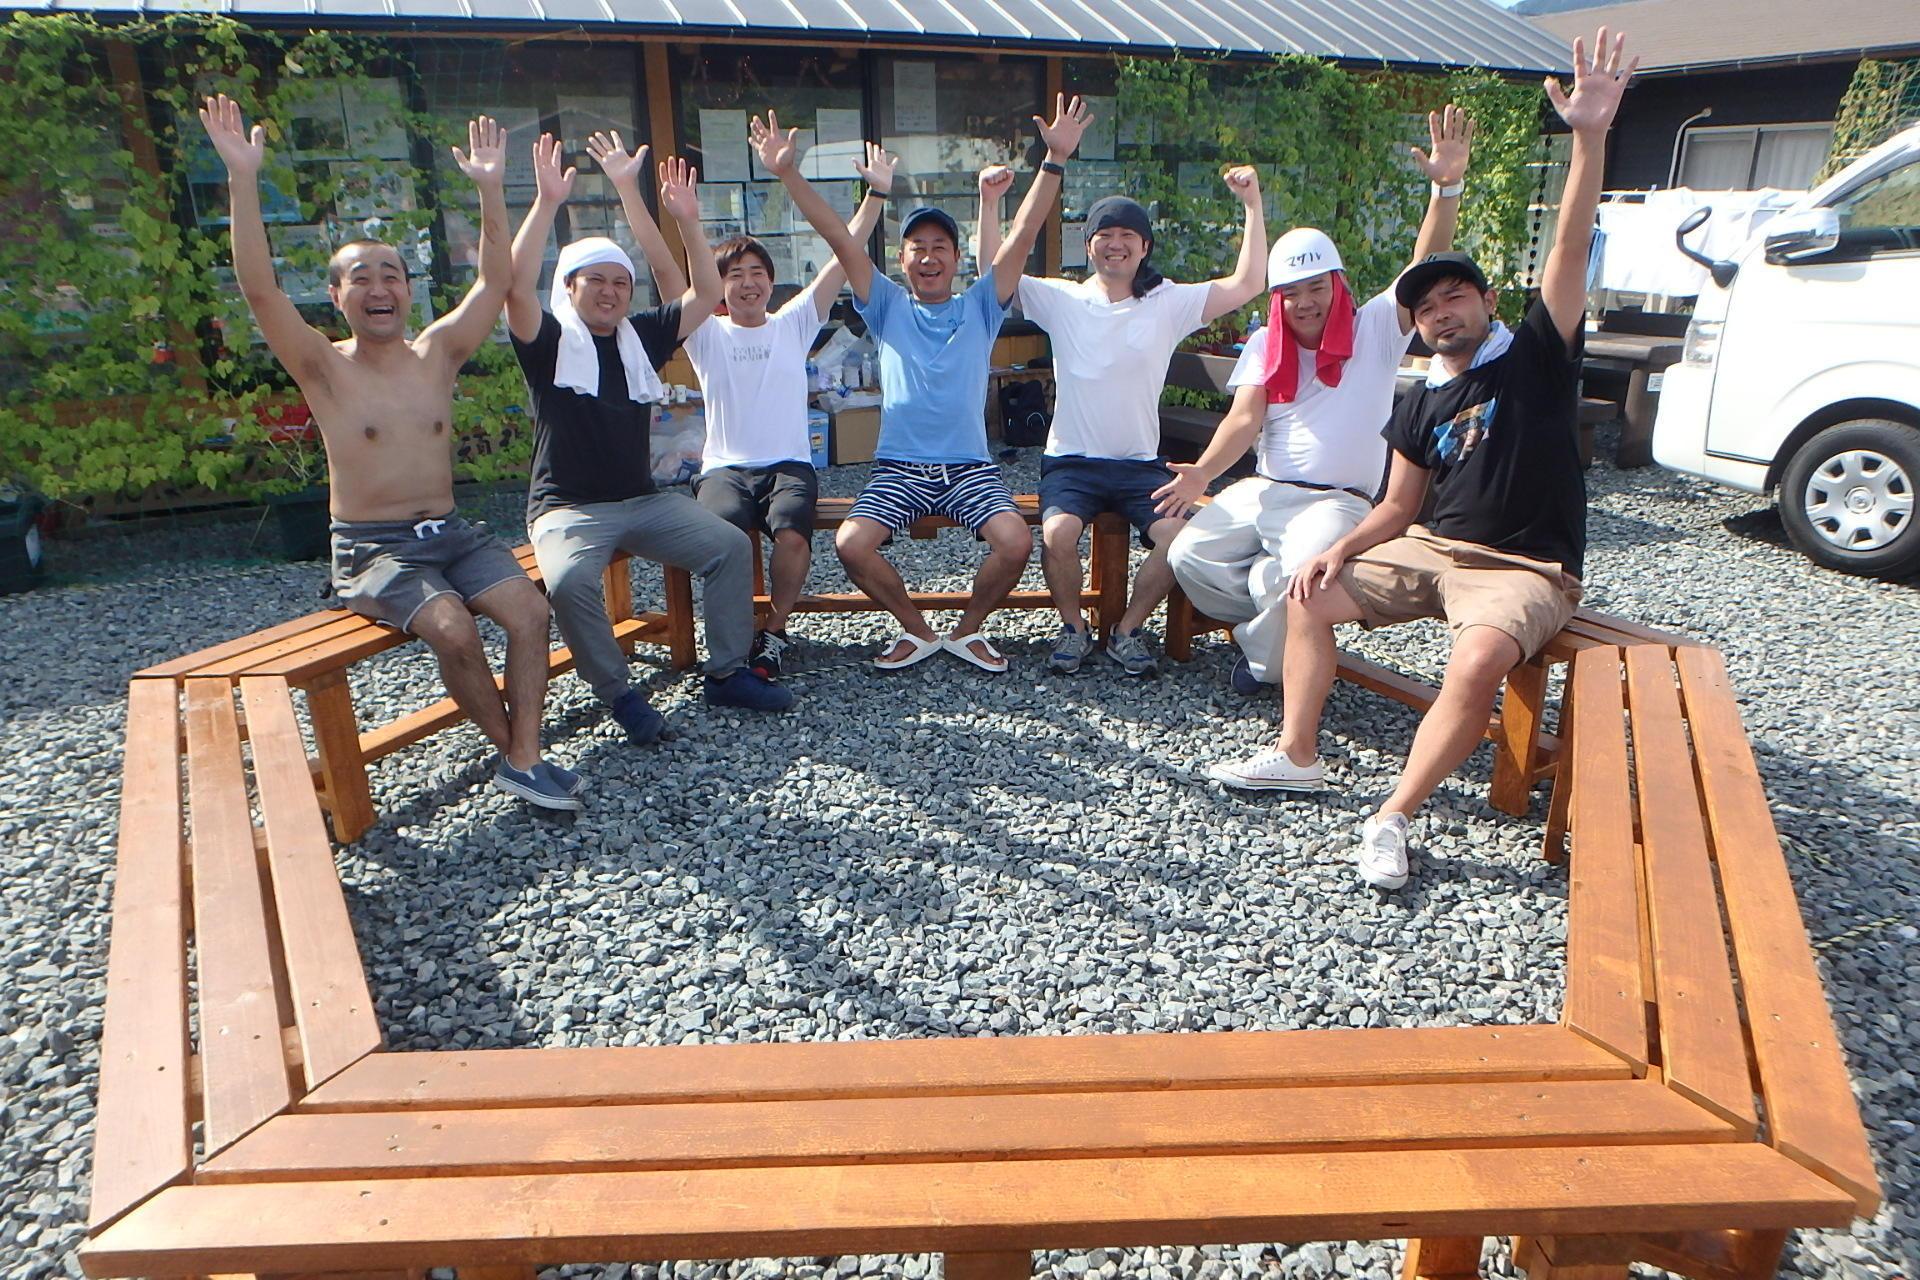 http://news.yoshimoto.co.jp/20180809123643-4bc10dbb3a55a5a0144c602828279cb2aea890a9.jpg